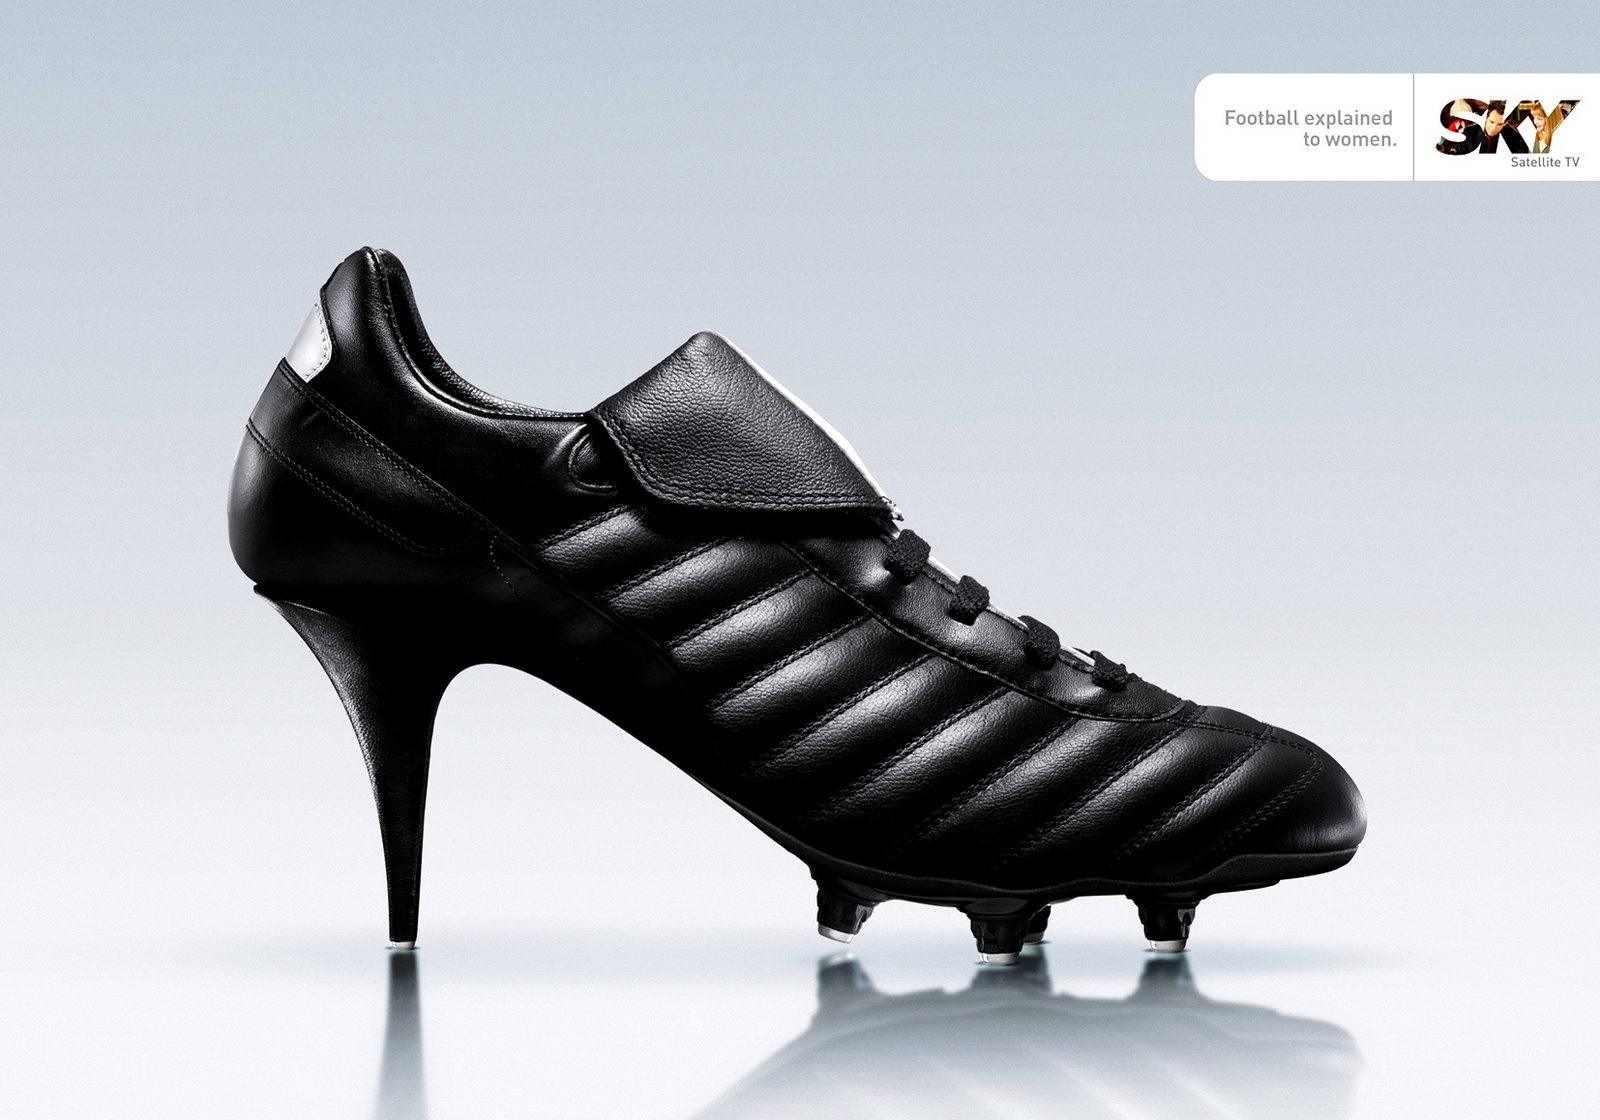 http://m.blog.hu/na/napiadag/image/birthday_hmm_hmm/SKY_Shoe.jpg